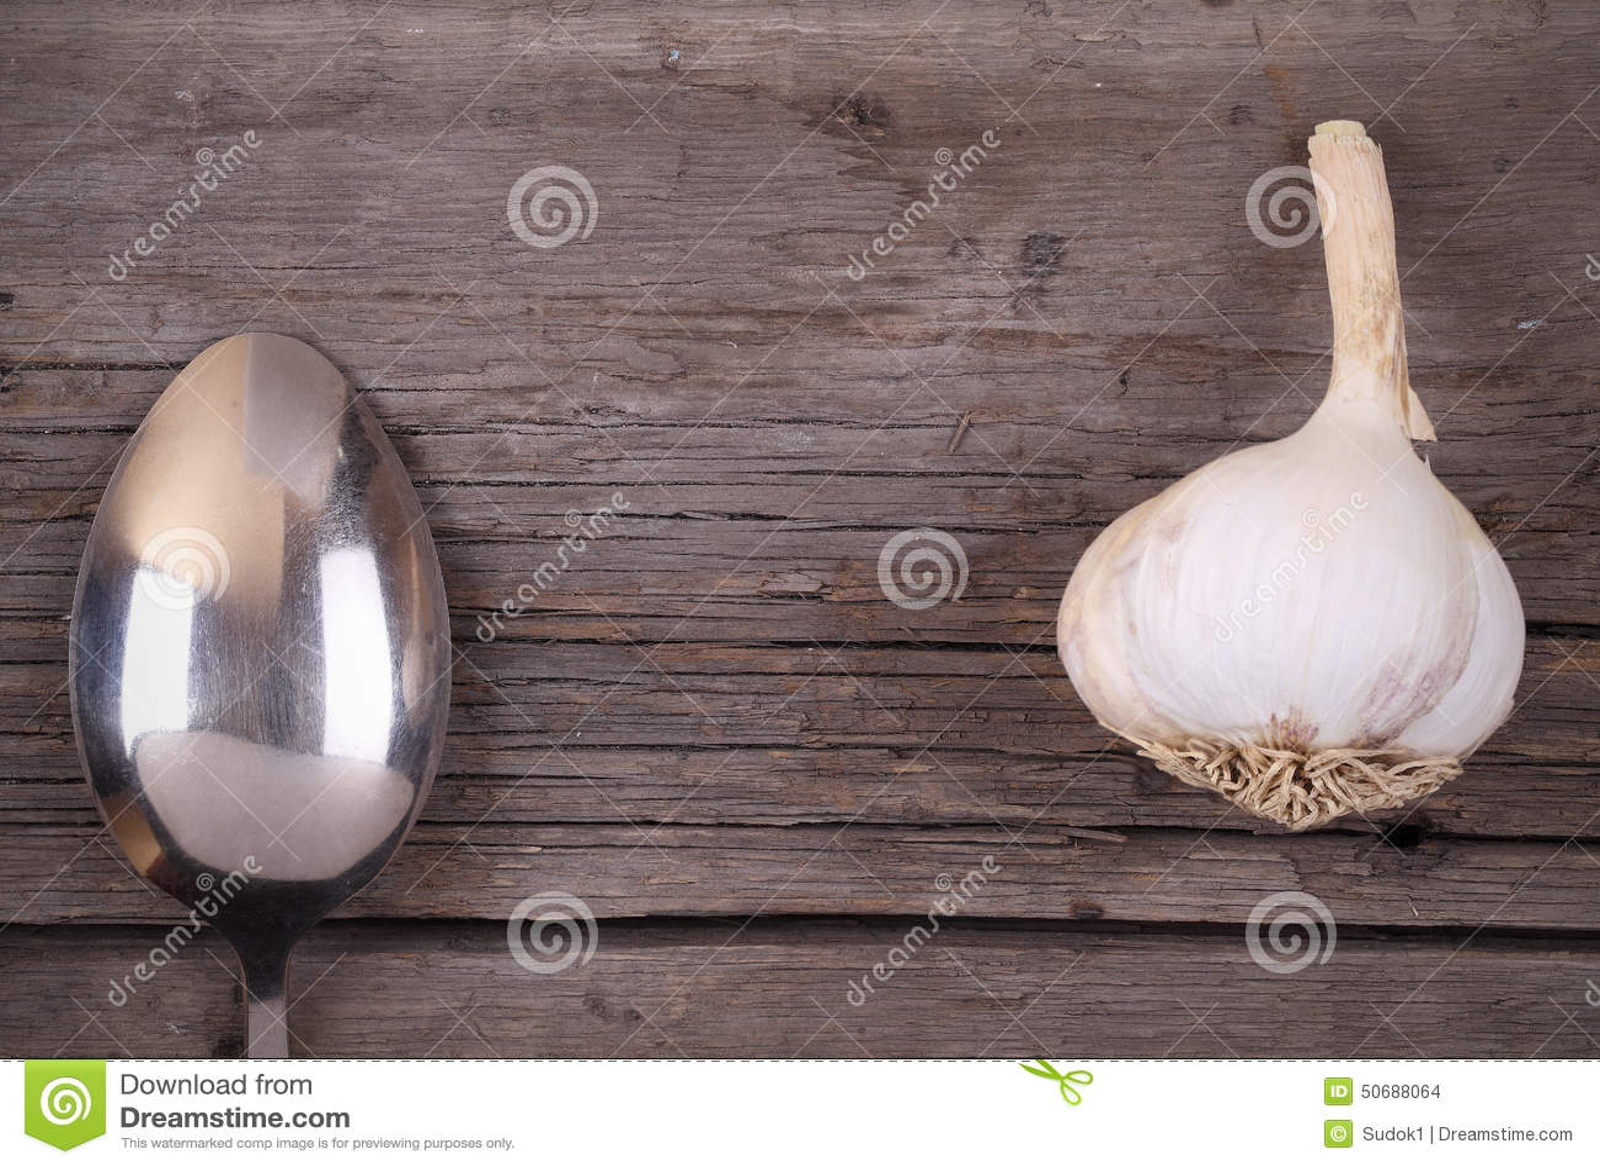 Download 匙子和大蒜在木背景 库存照片. 图片 包括有 菜单, ,并且, 成份, 文化, 背包徒步旅行者, 国内, 作用 - 50688064